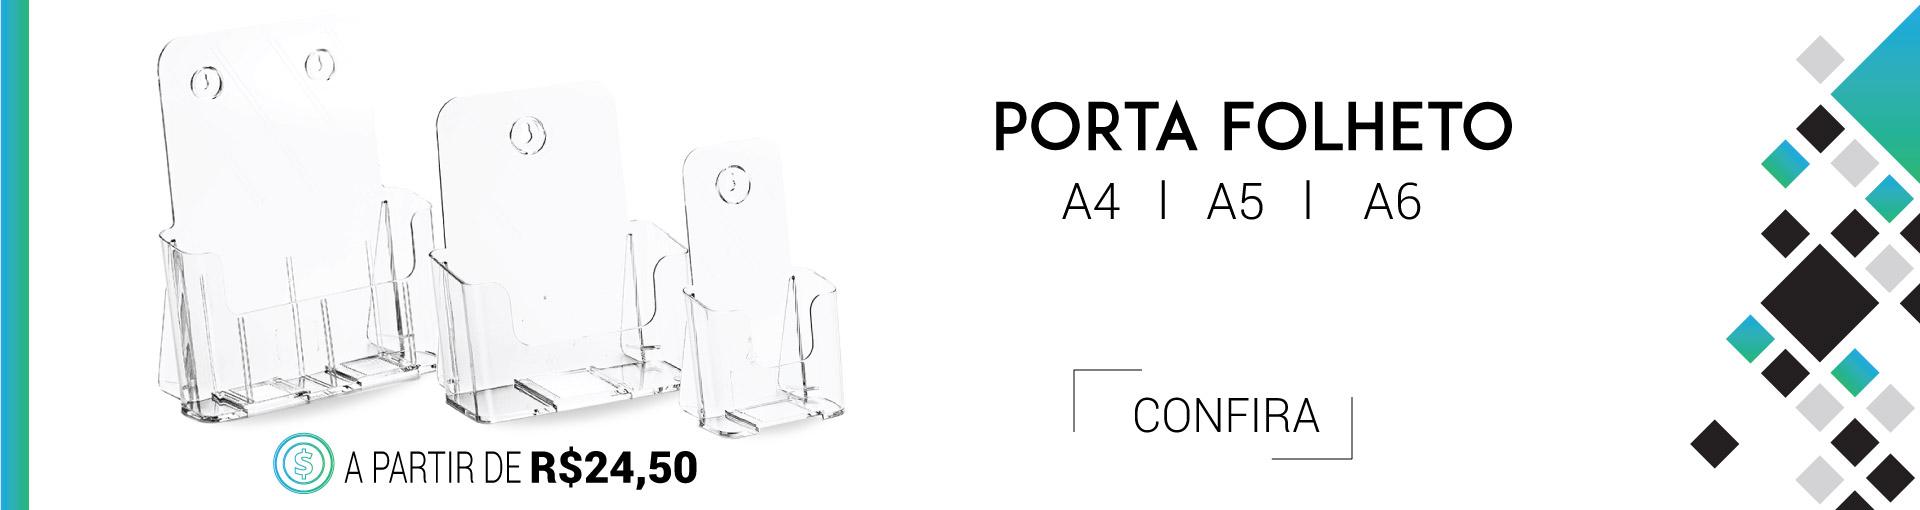 Porta Folheto